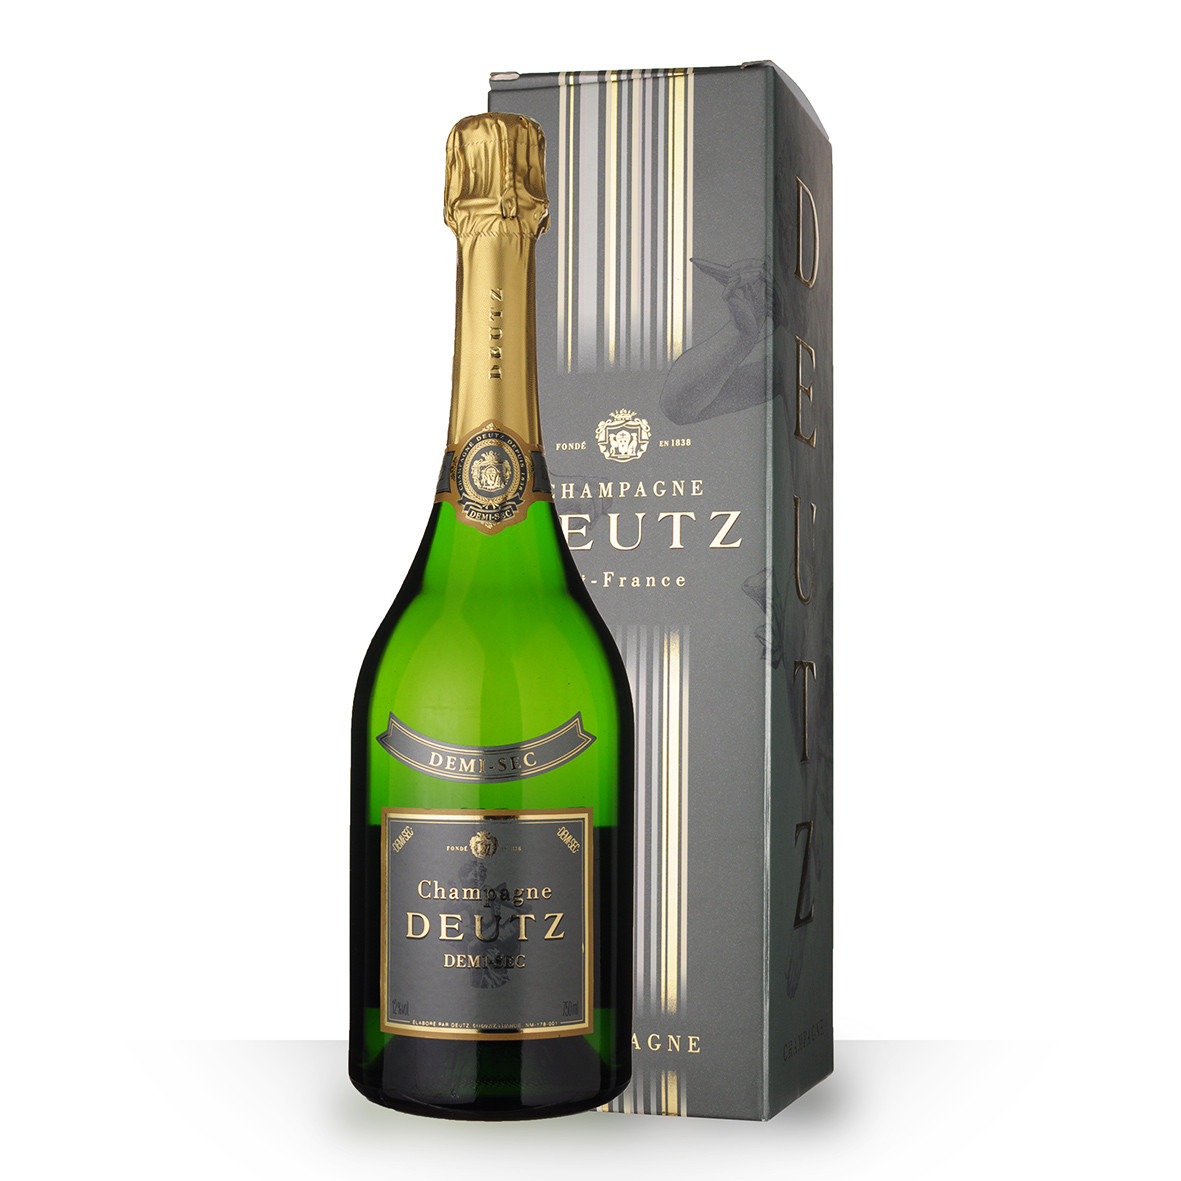 Champagne Deutz Demi-Sec 75cl Etui www.odyssee-vins.com